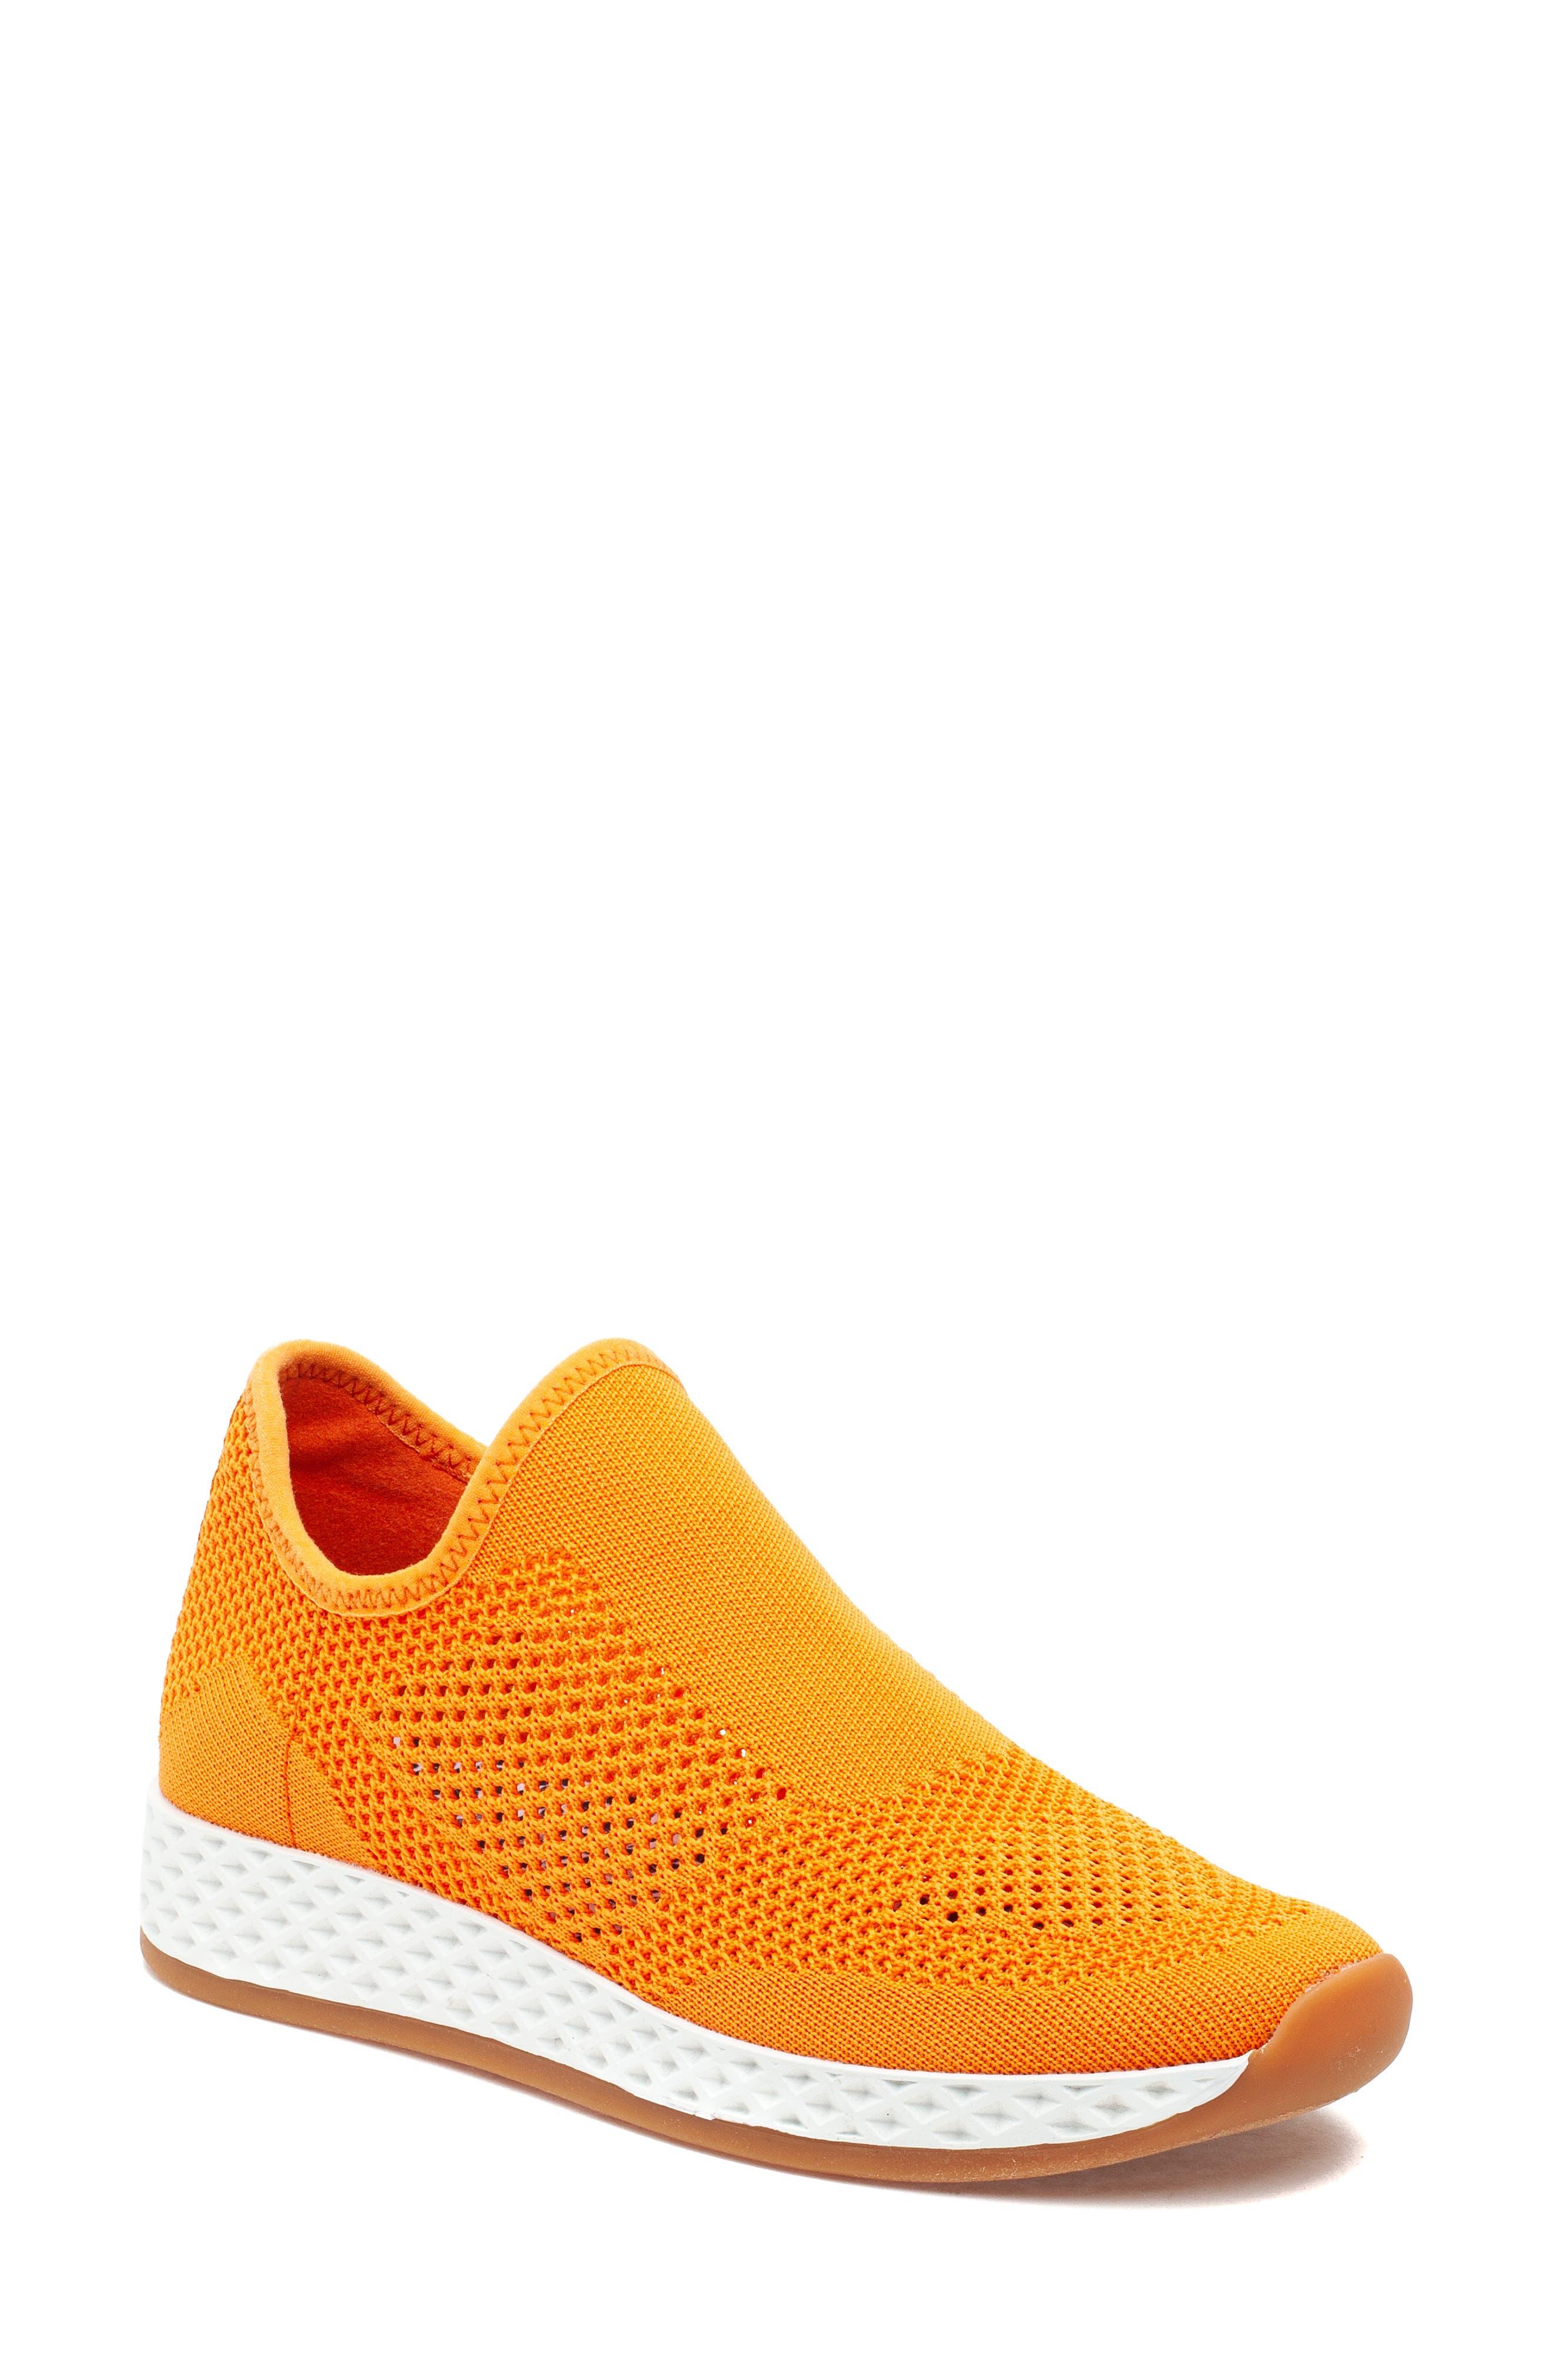 Tiger Slip-On Sneaker